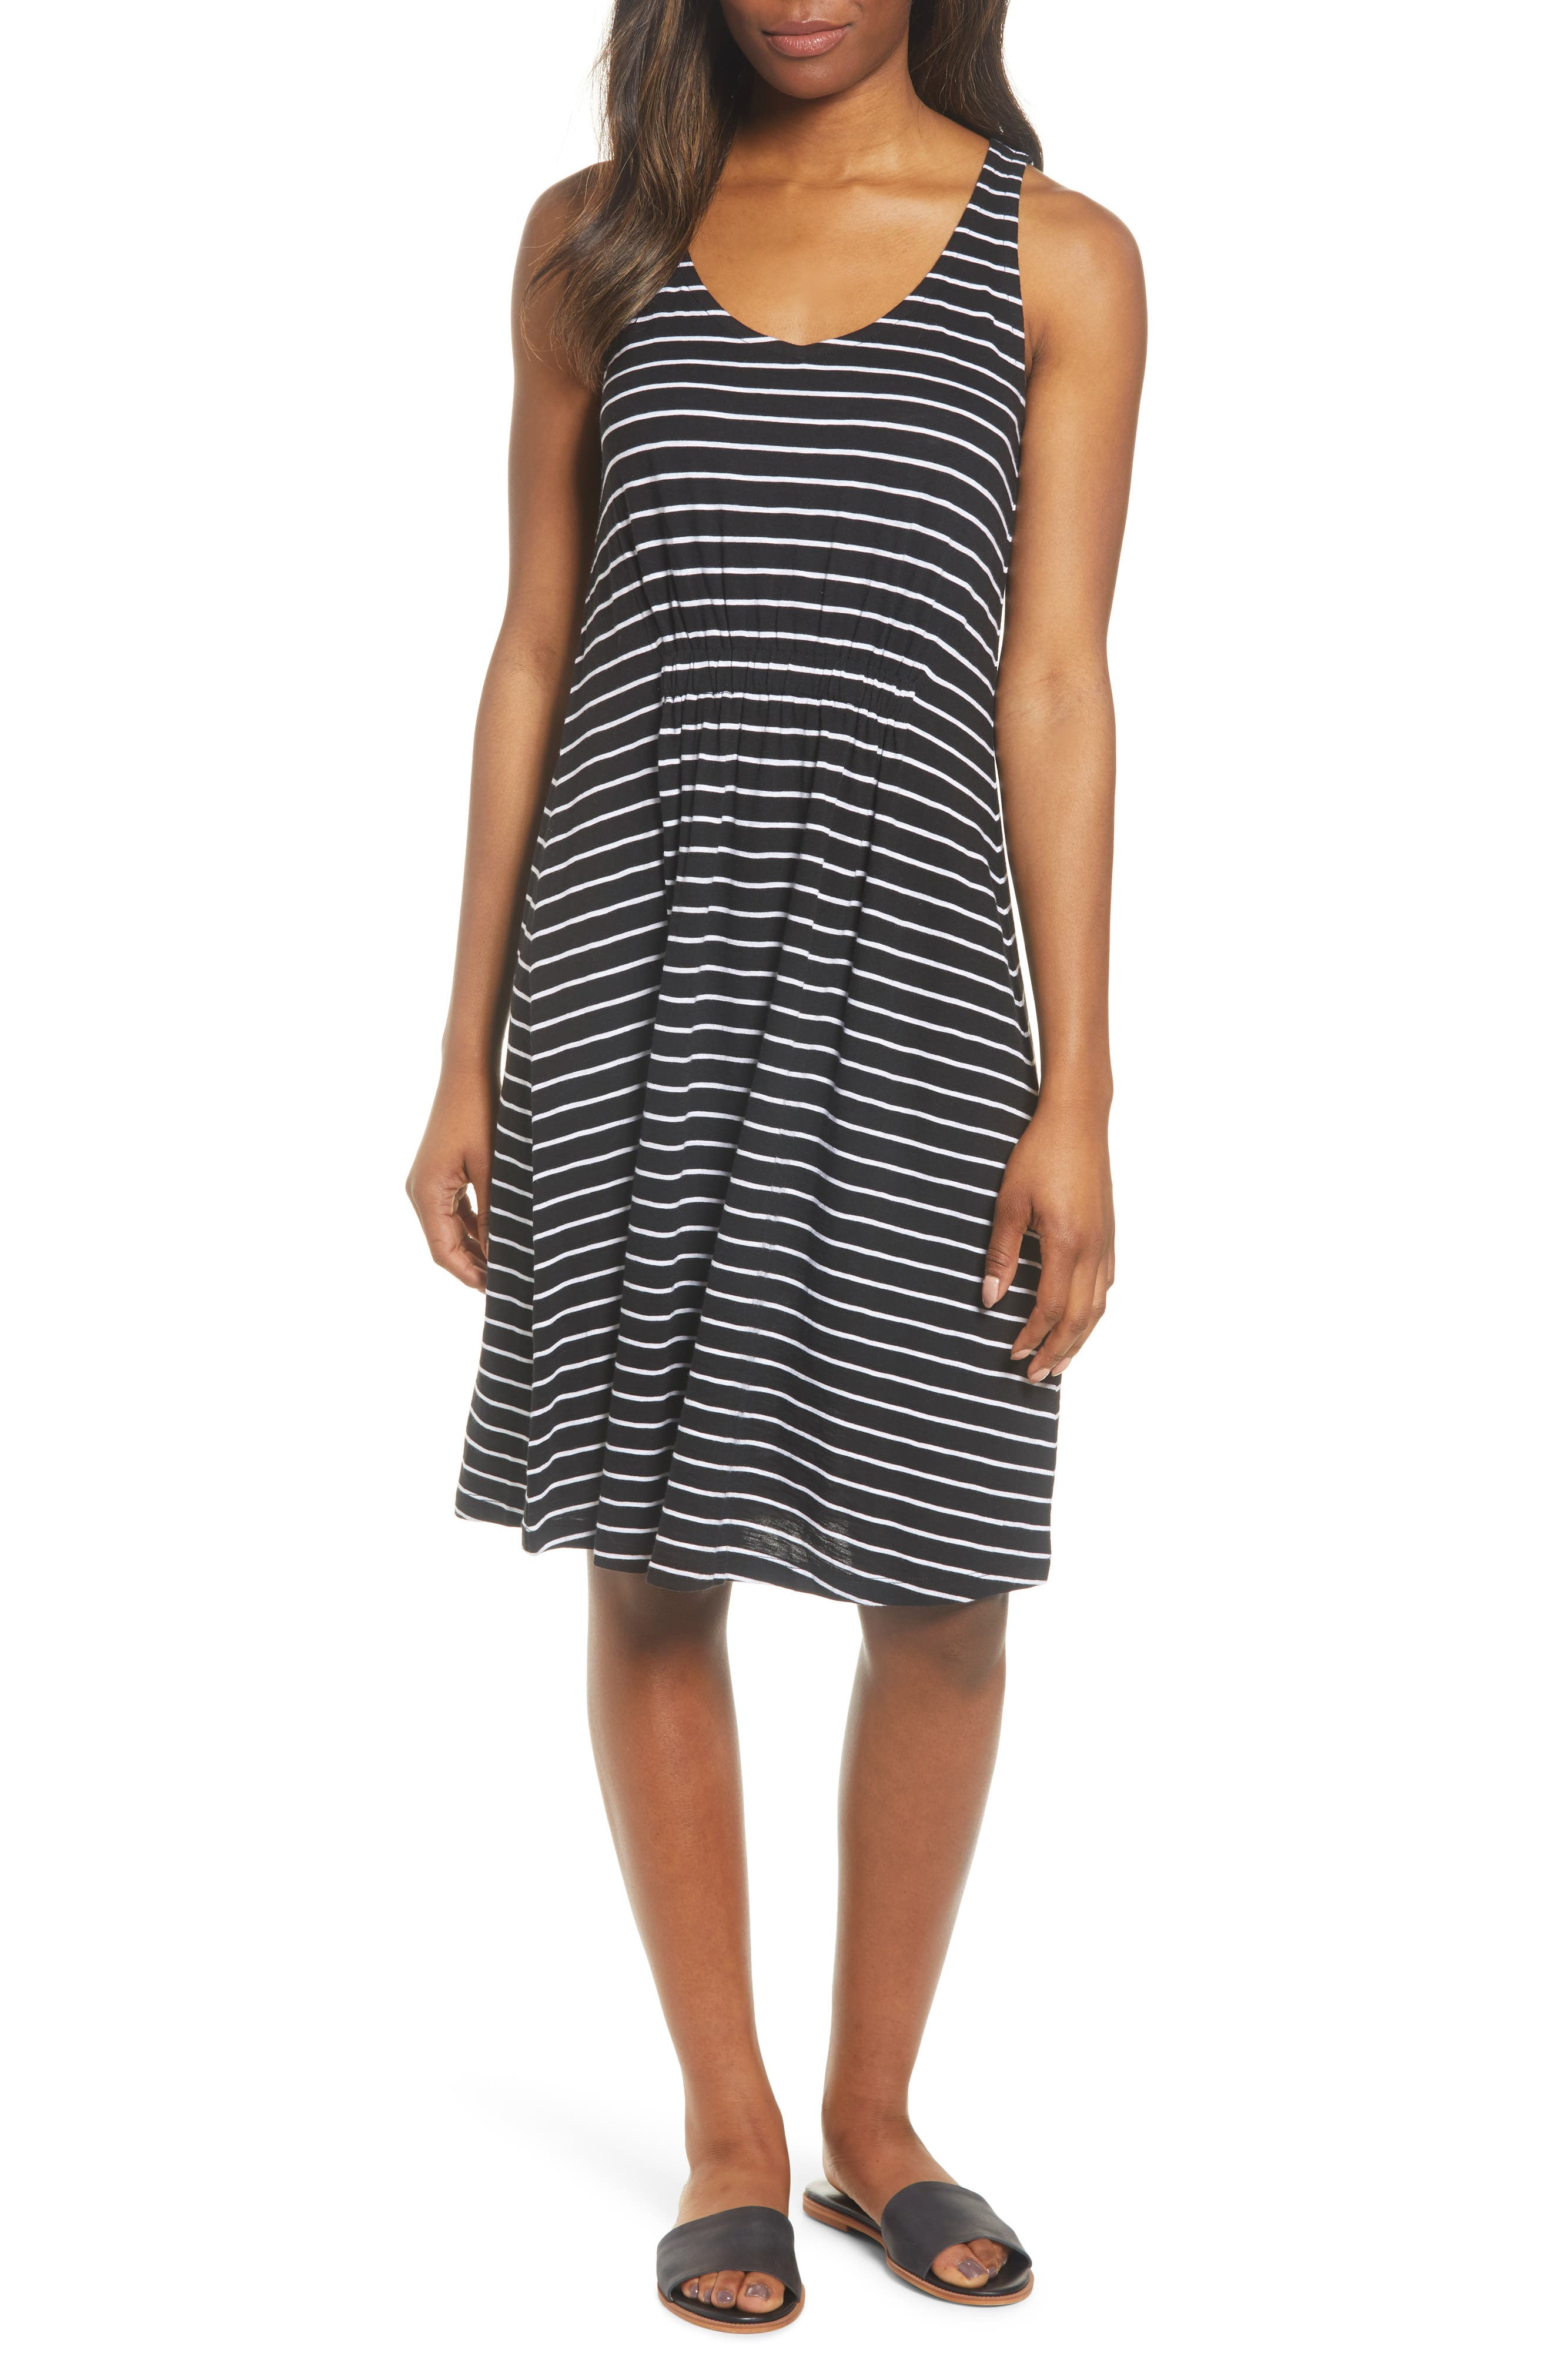 Petite Caslon Sleeveless Knit Dress, Black